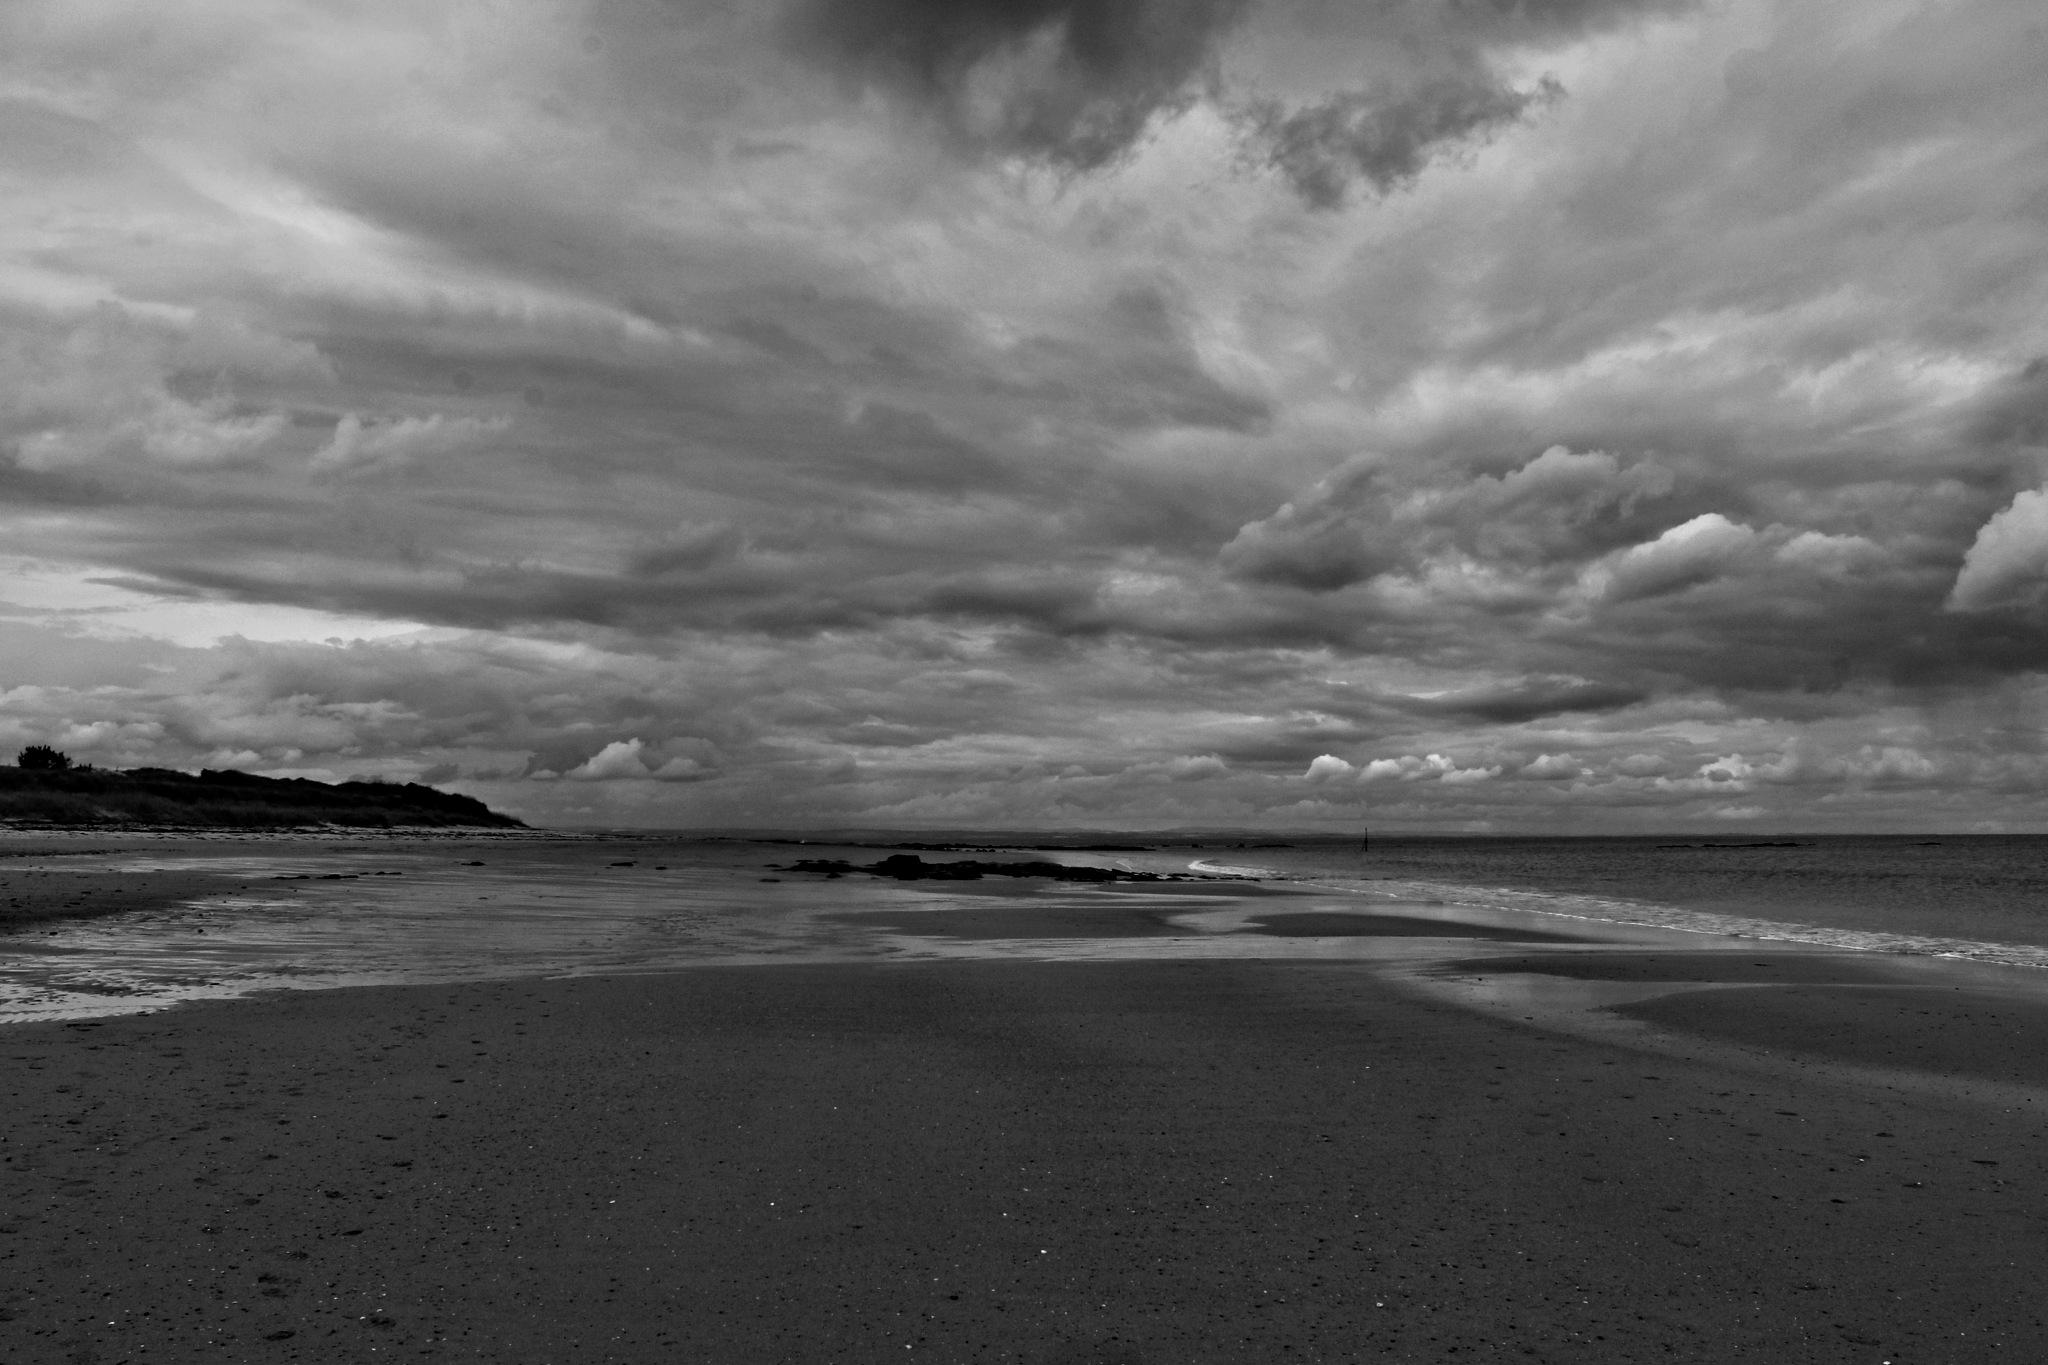 Deserted beach by Rich66